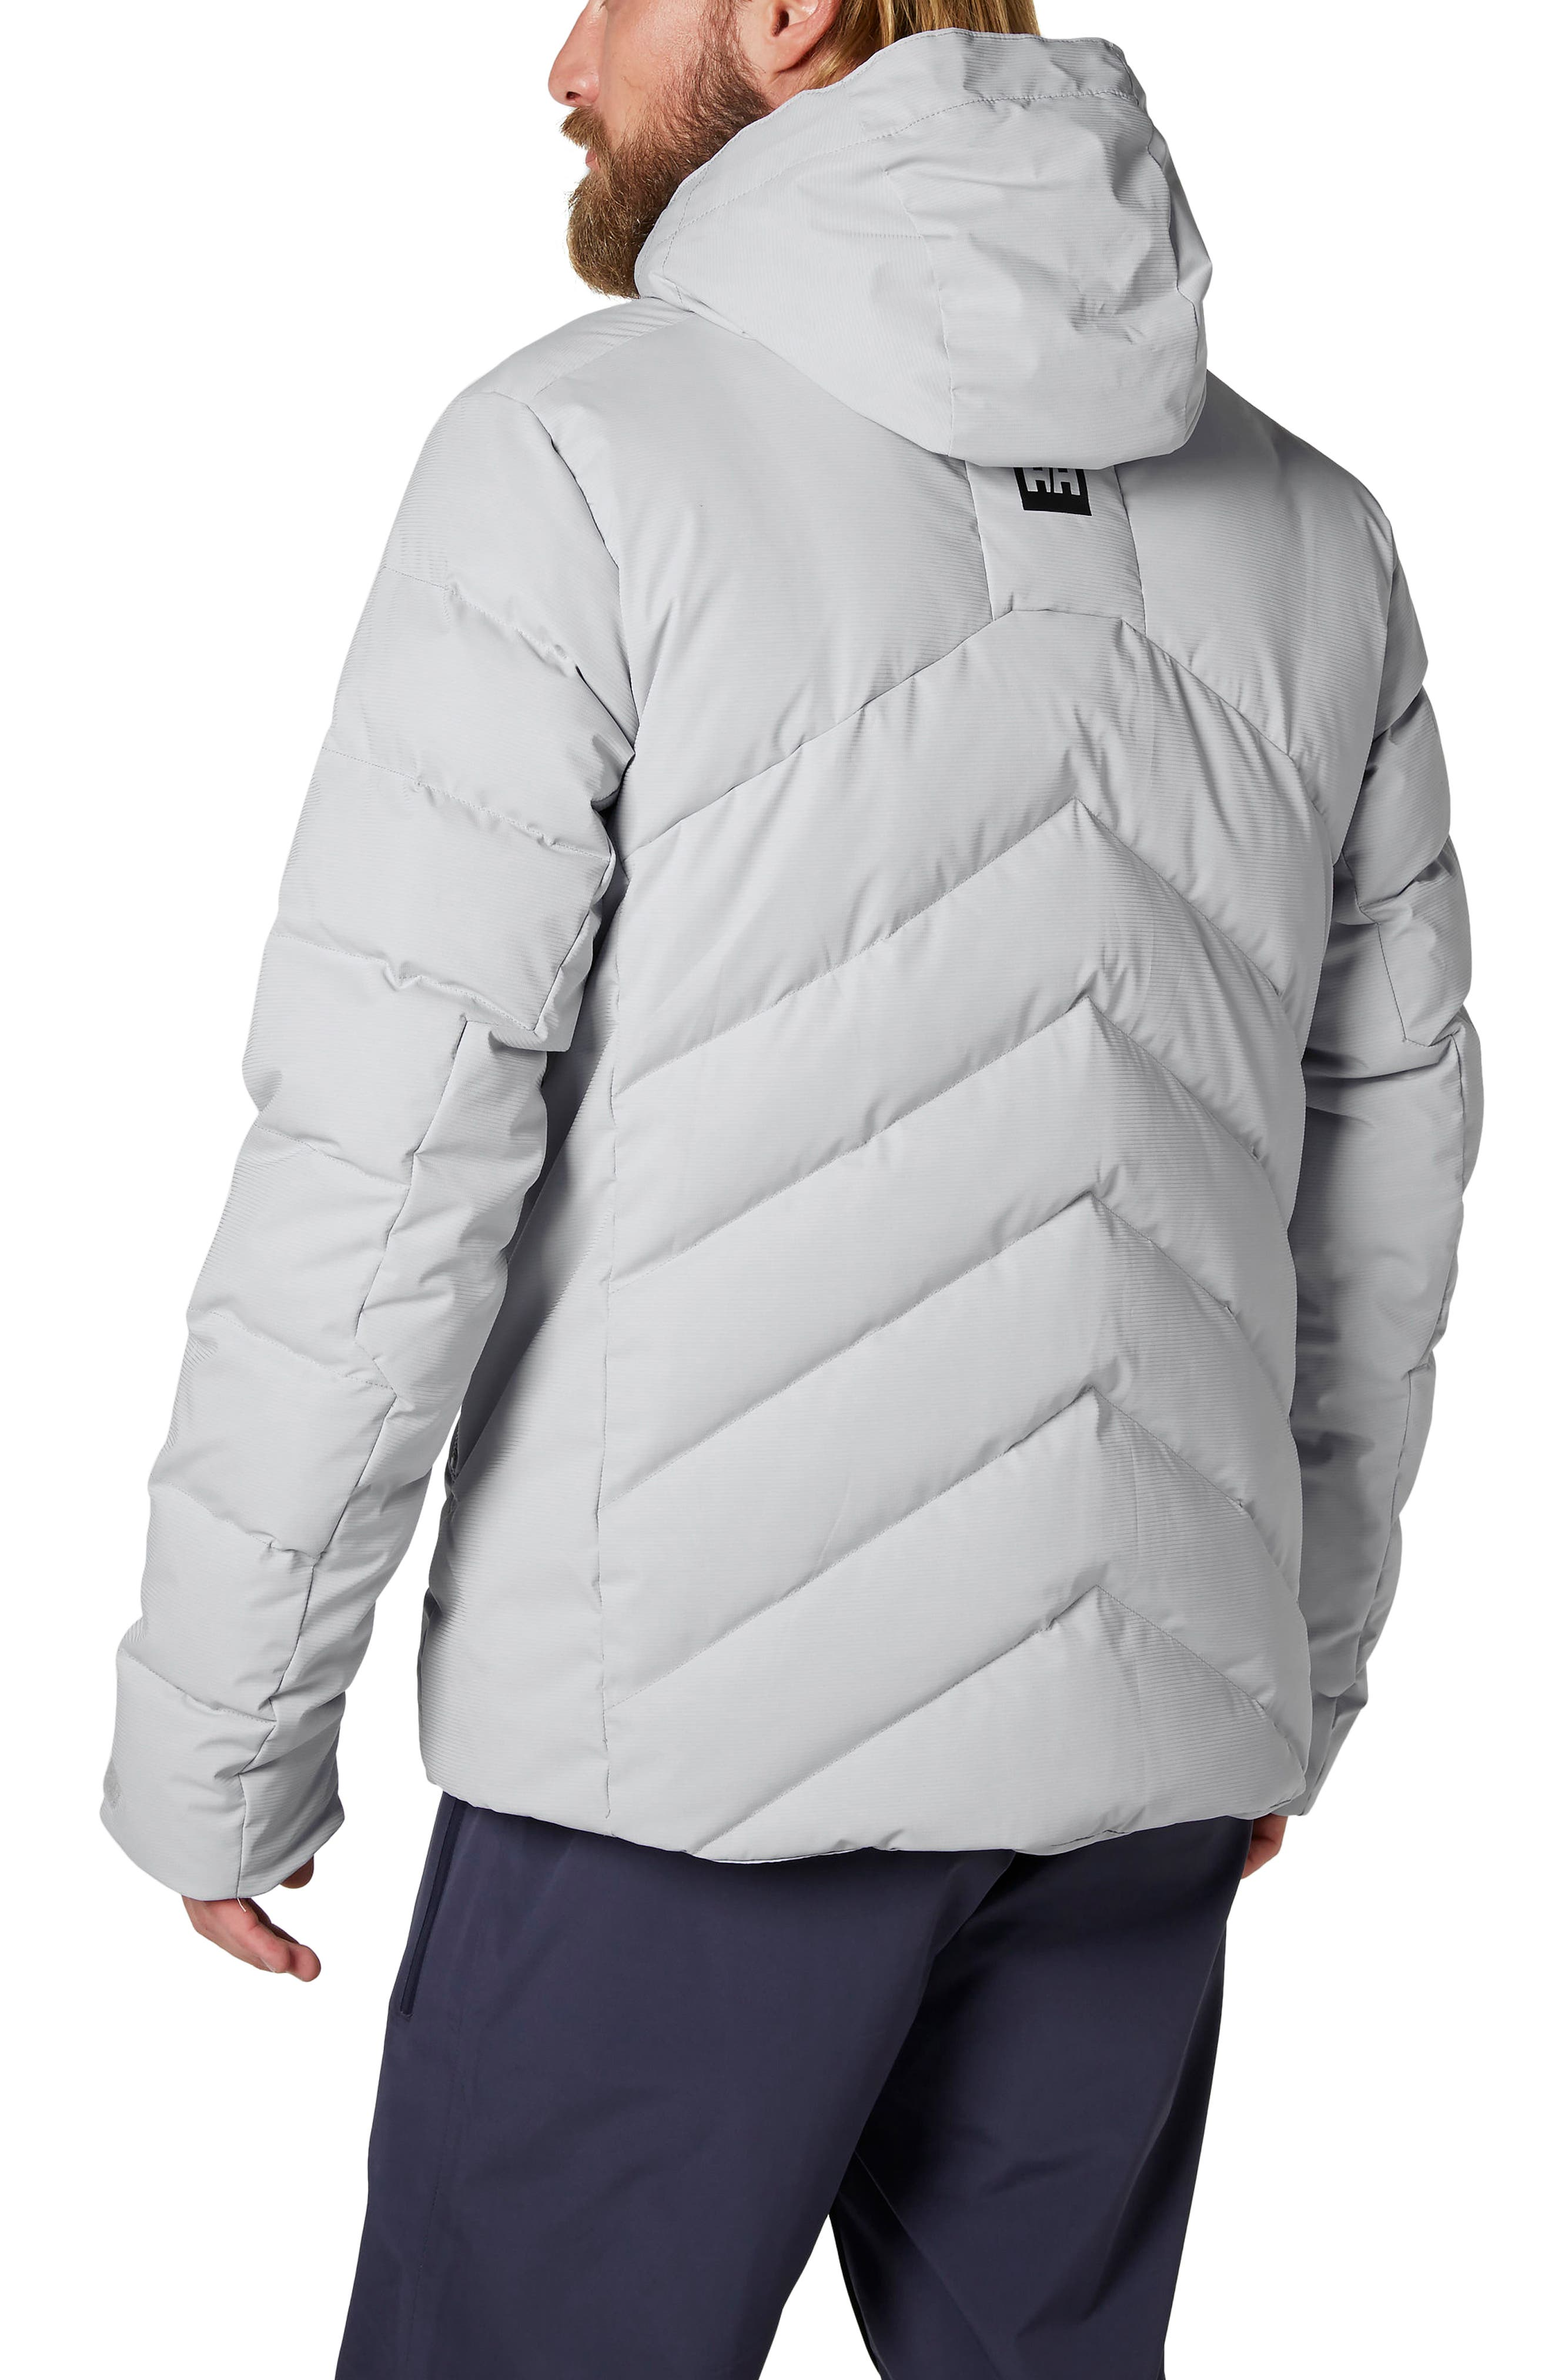 Swift Waterproof Down Hooded Jacket,                             Alternate thumbnail 2, color,                             020